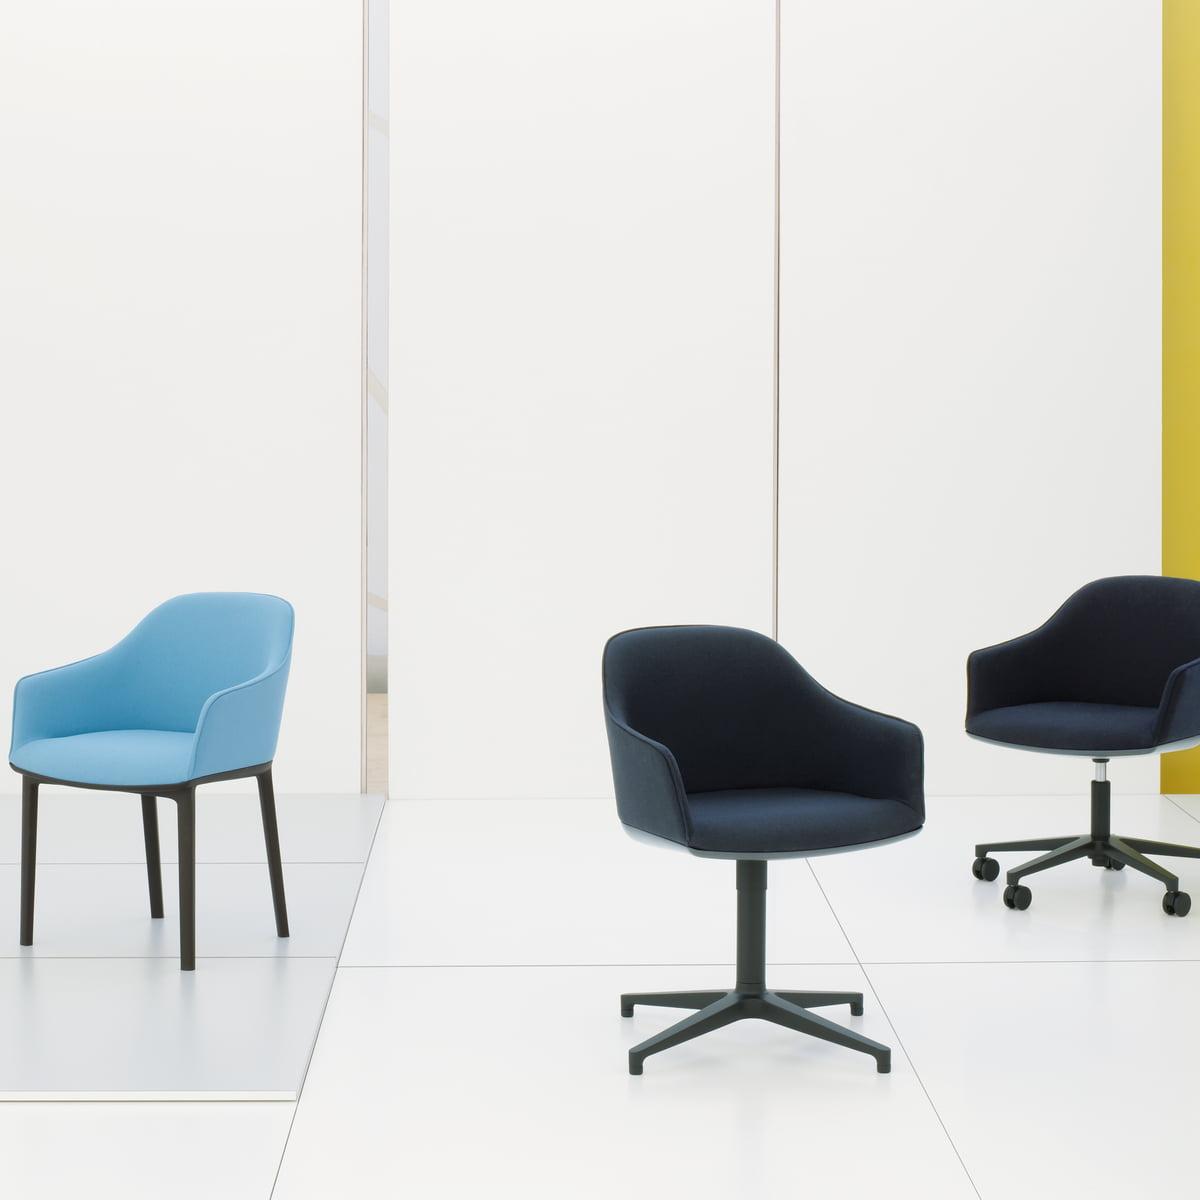 softshell chair von vitra connox. Black Bedroom Furniture Sets. Home Design Ideas